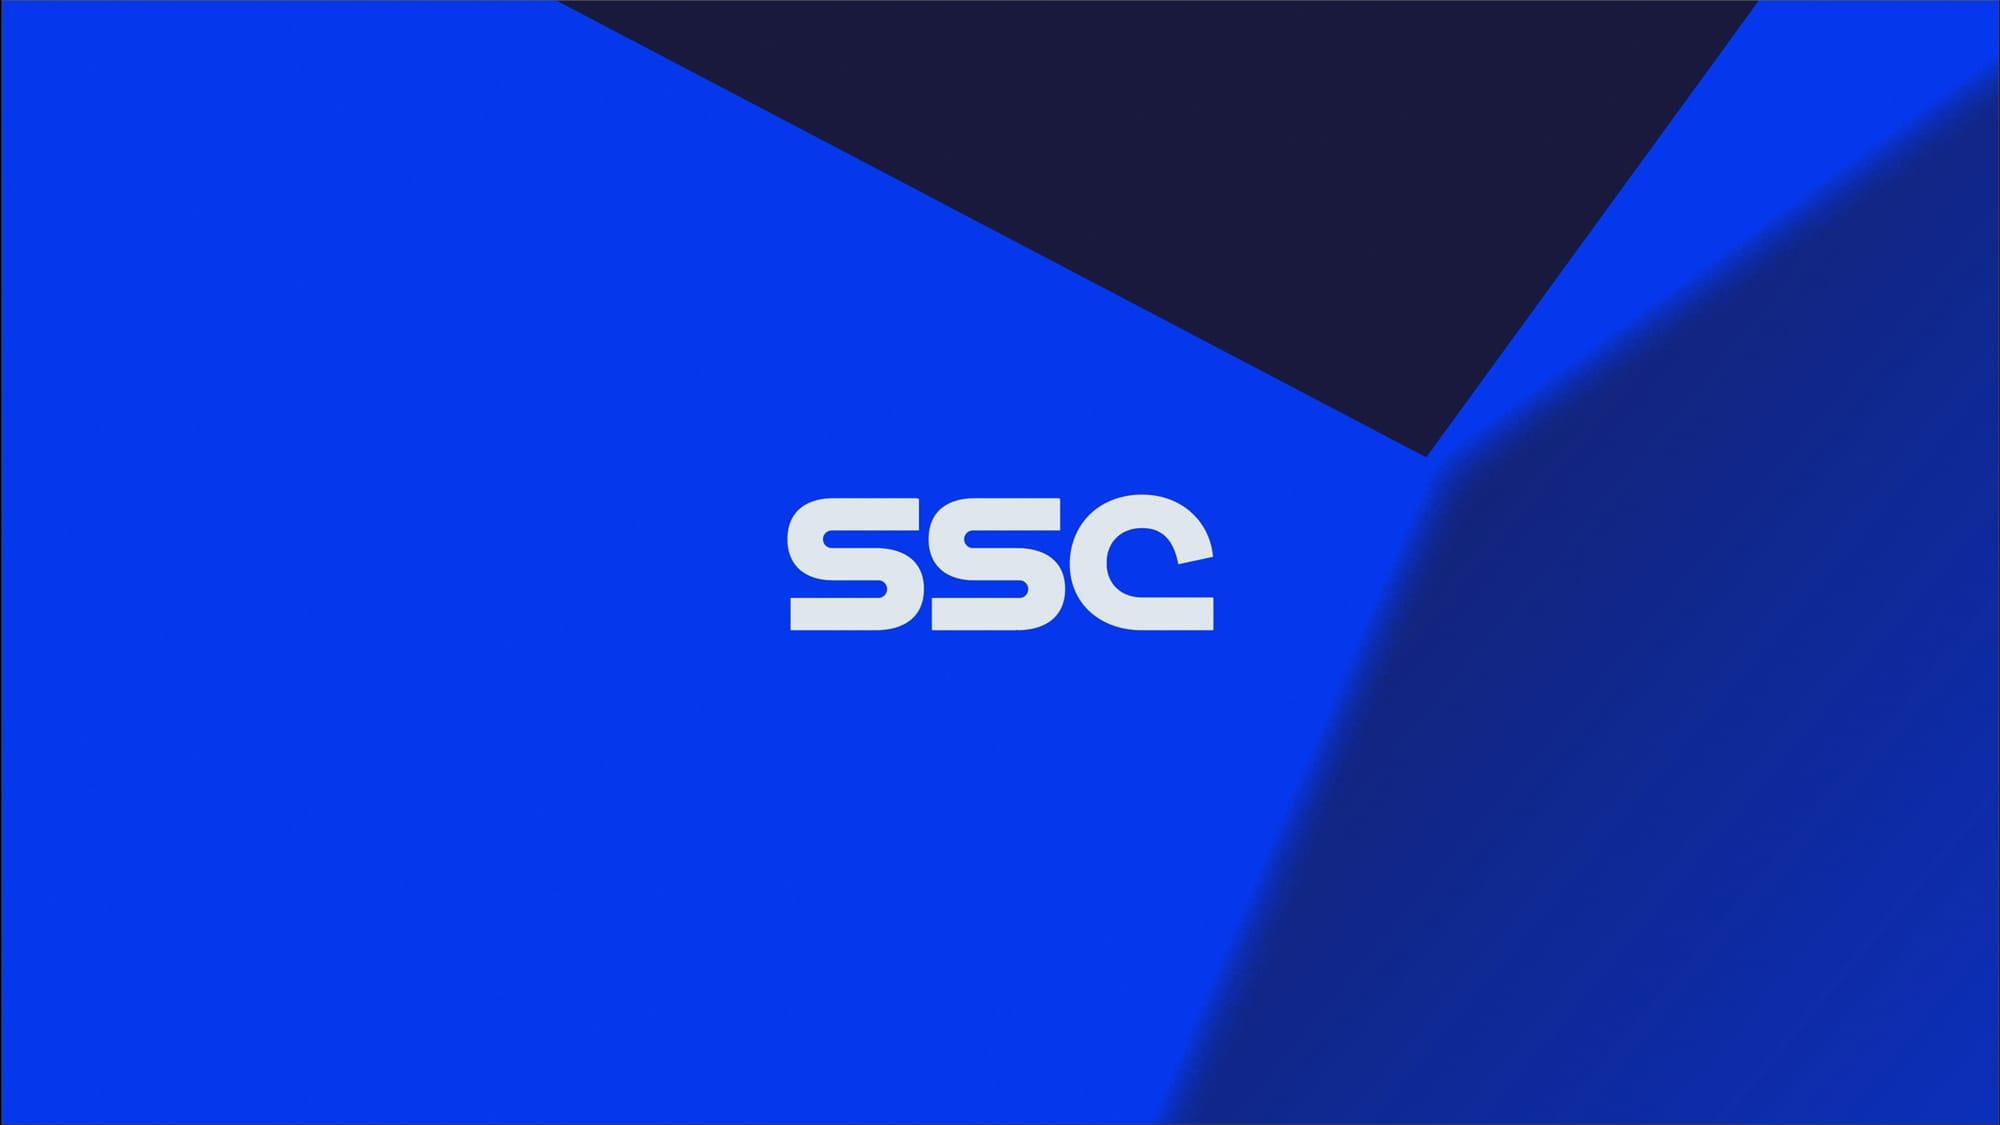 Saudi Sports Channel Brand